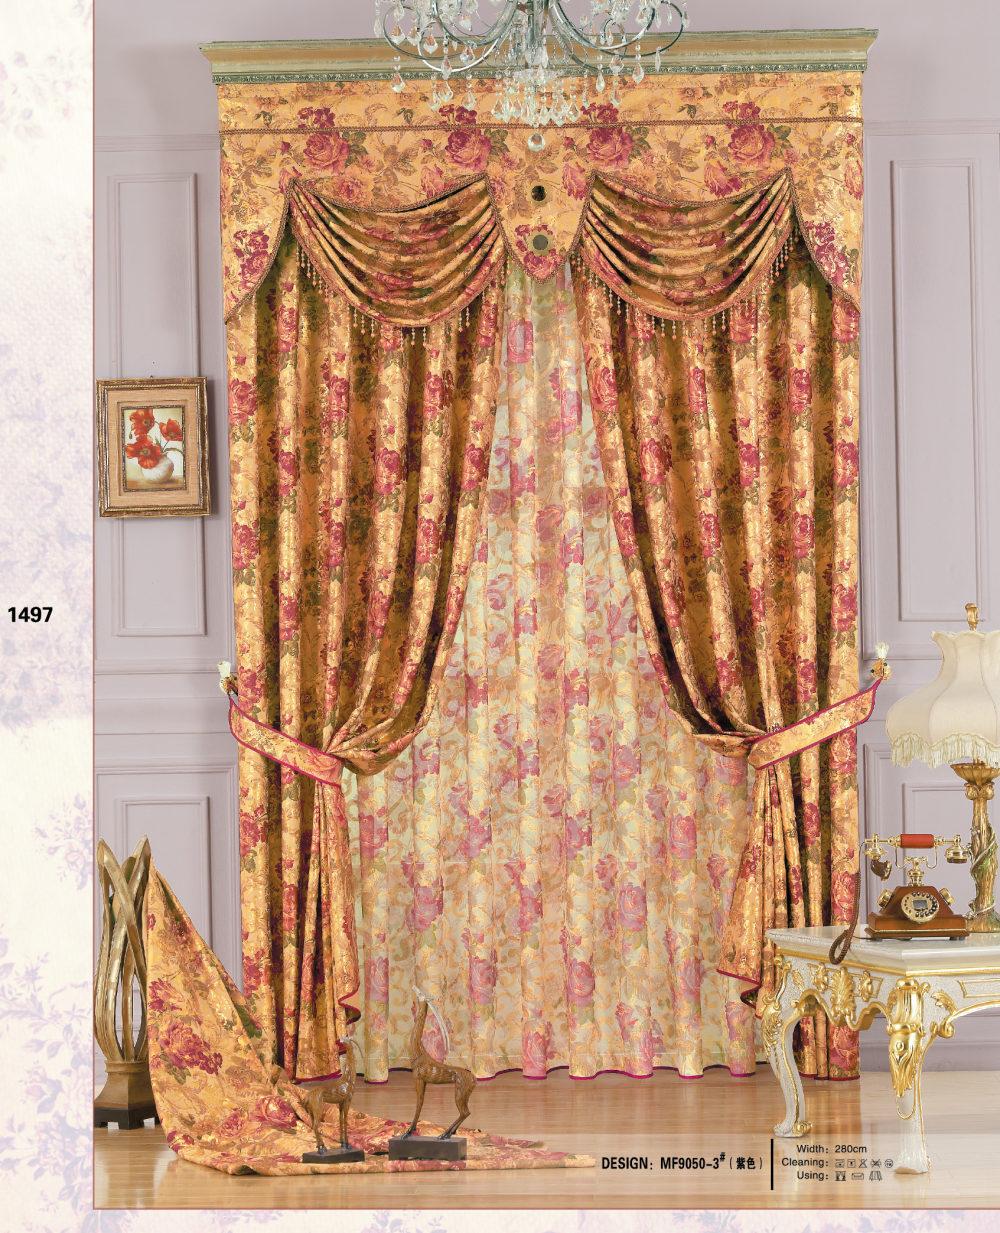 Aiden 收藏窗帘图片高清图(用方案里很清晰。)免费~_9.jpg